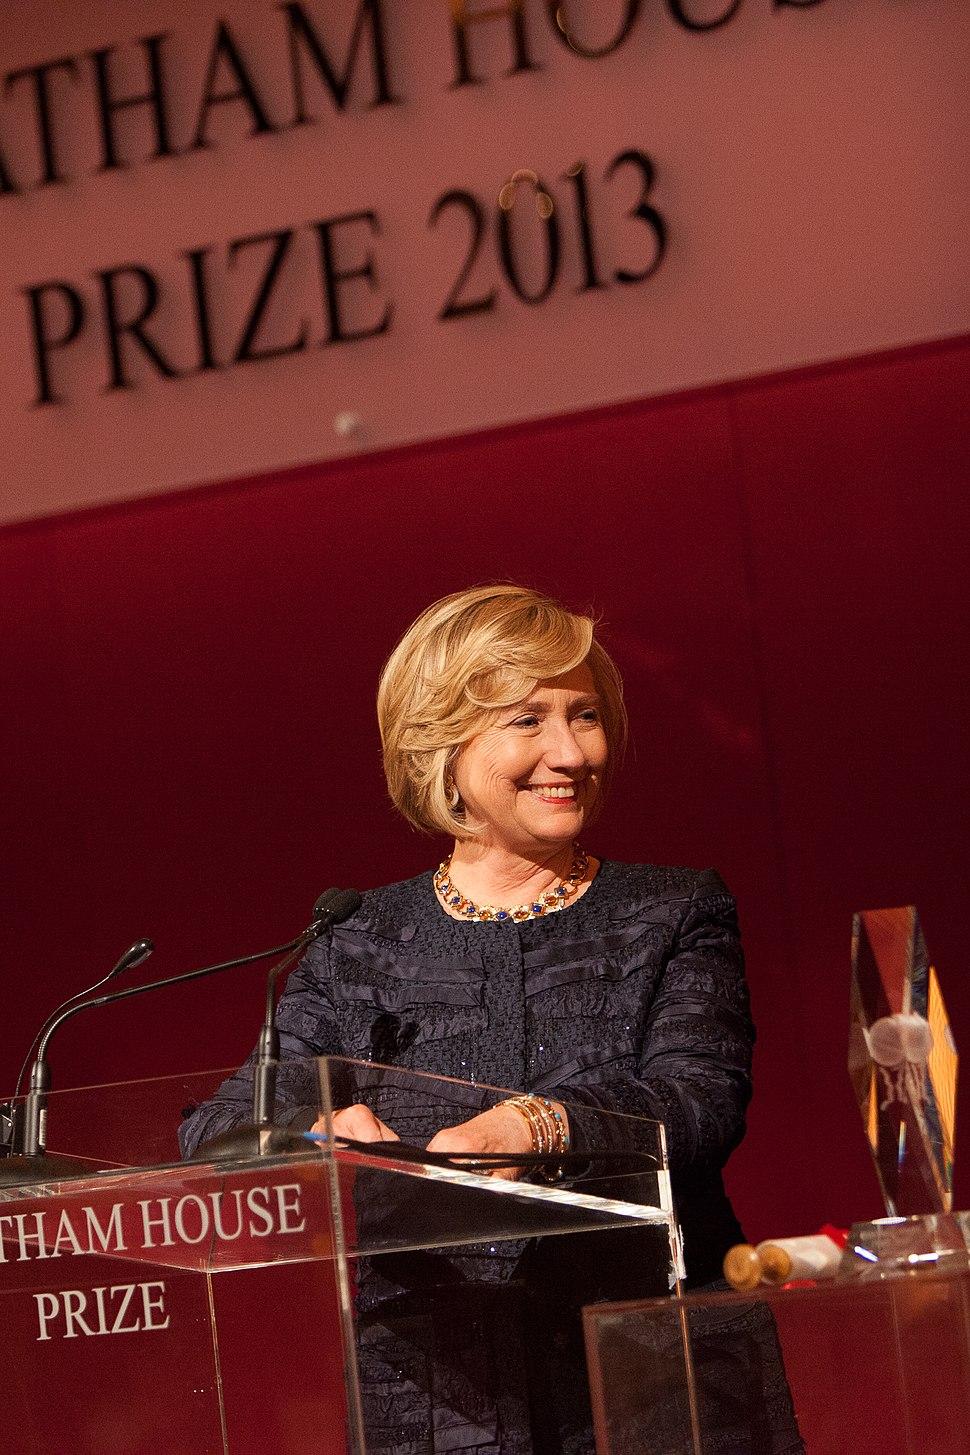 Hillary Rodham Clinton Chatham House Prize 2013 Award Ceremony (10224254843)